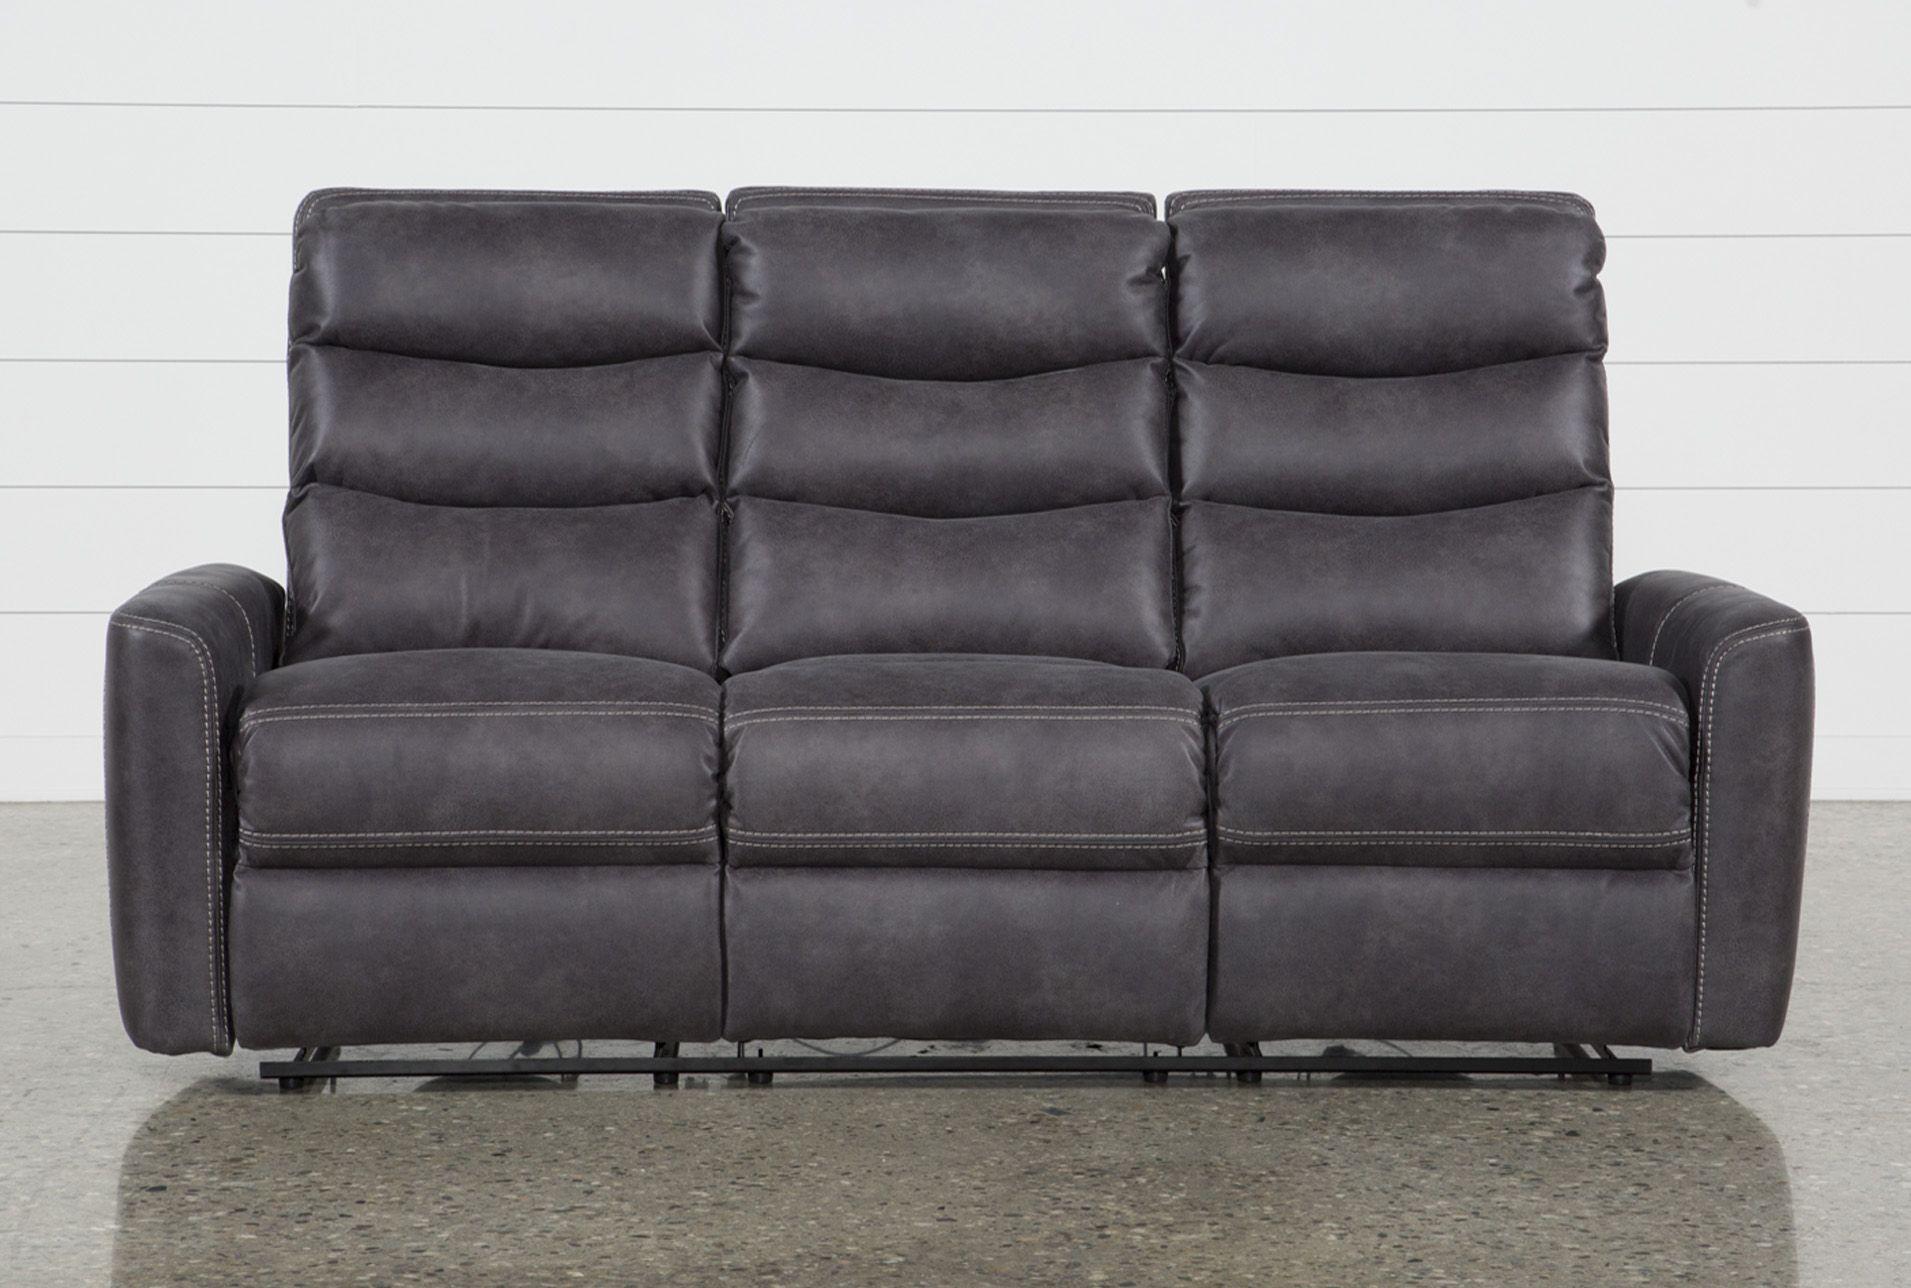 Malia Power Reclining Sofa With Usb Port Grey 695 Reclining